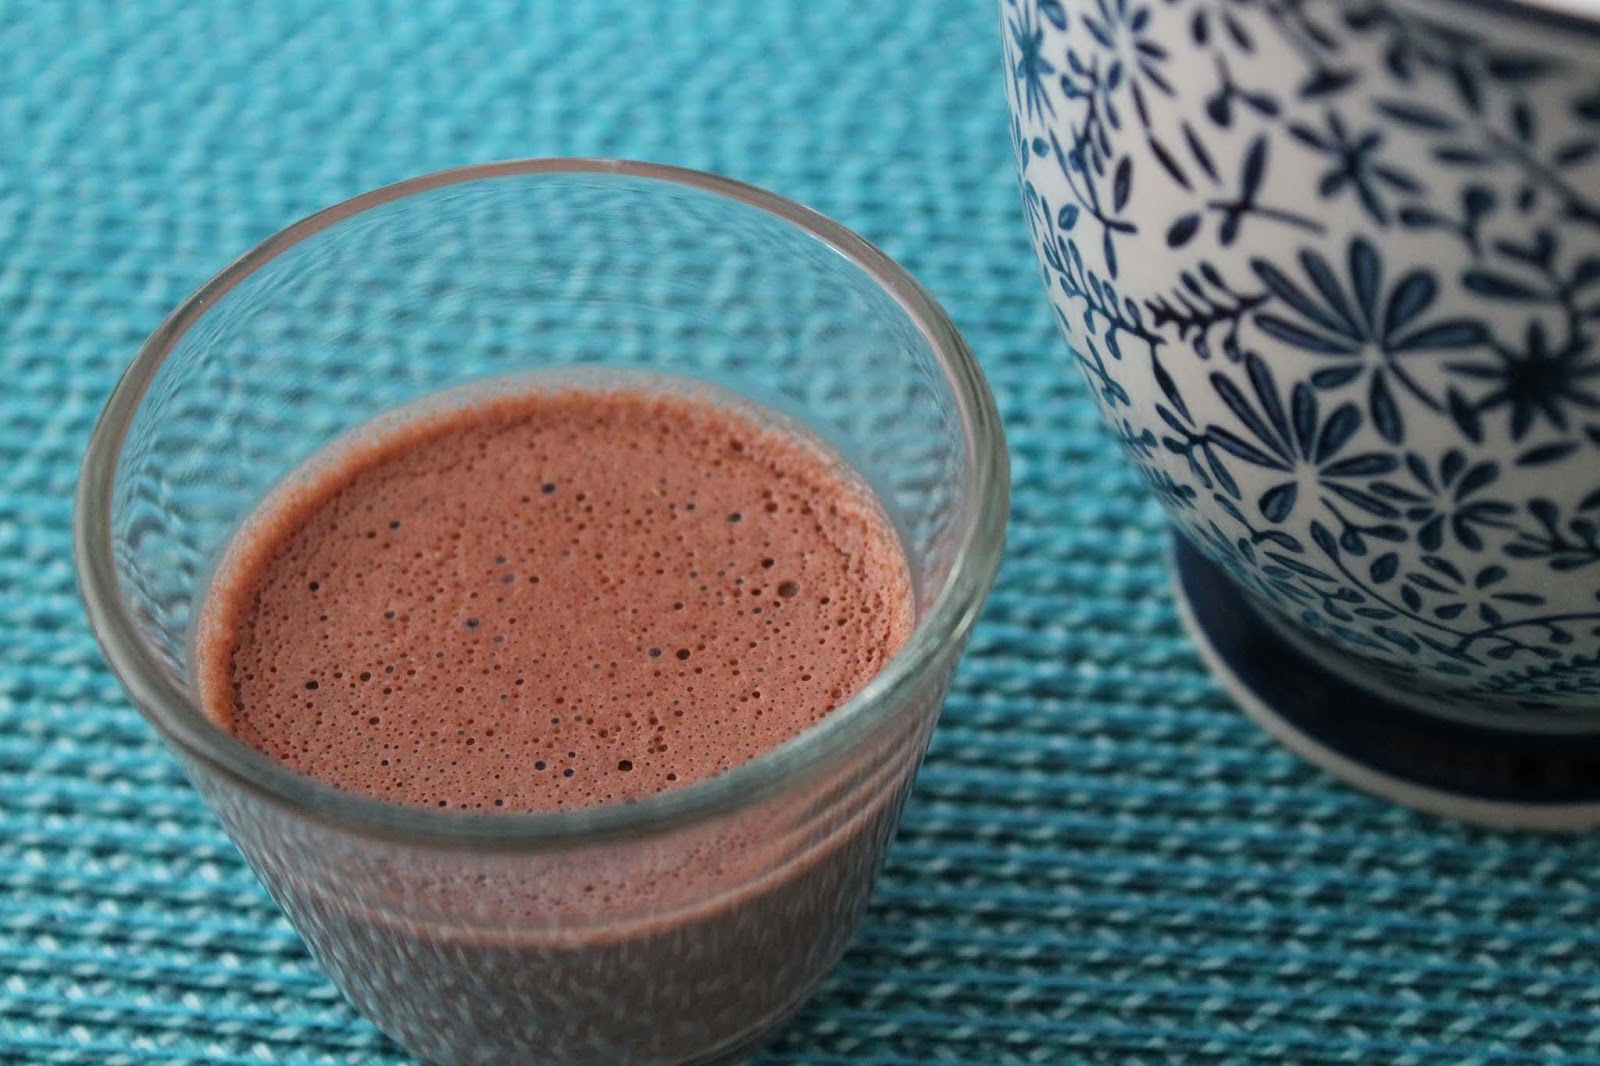 Chokladpannacotta lchf